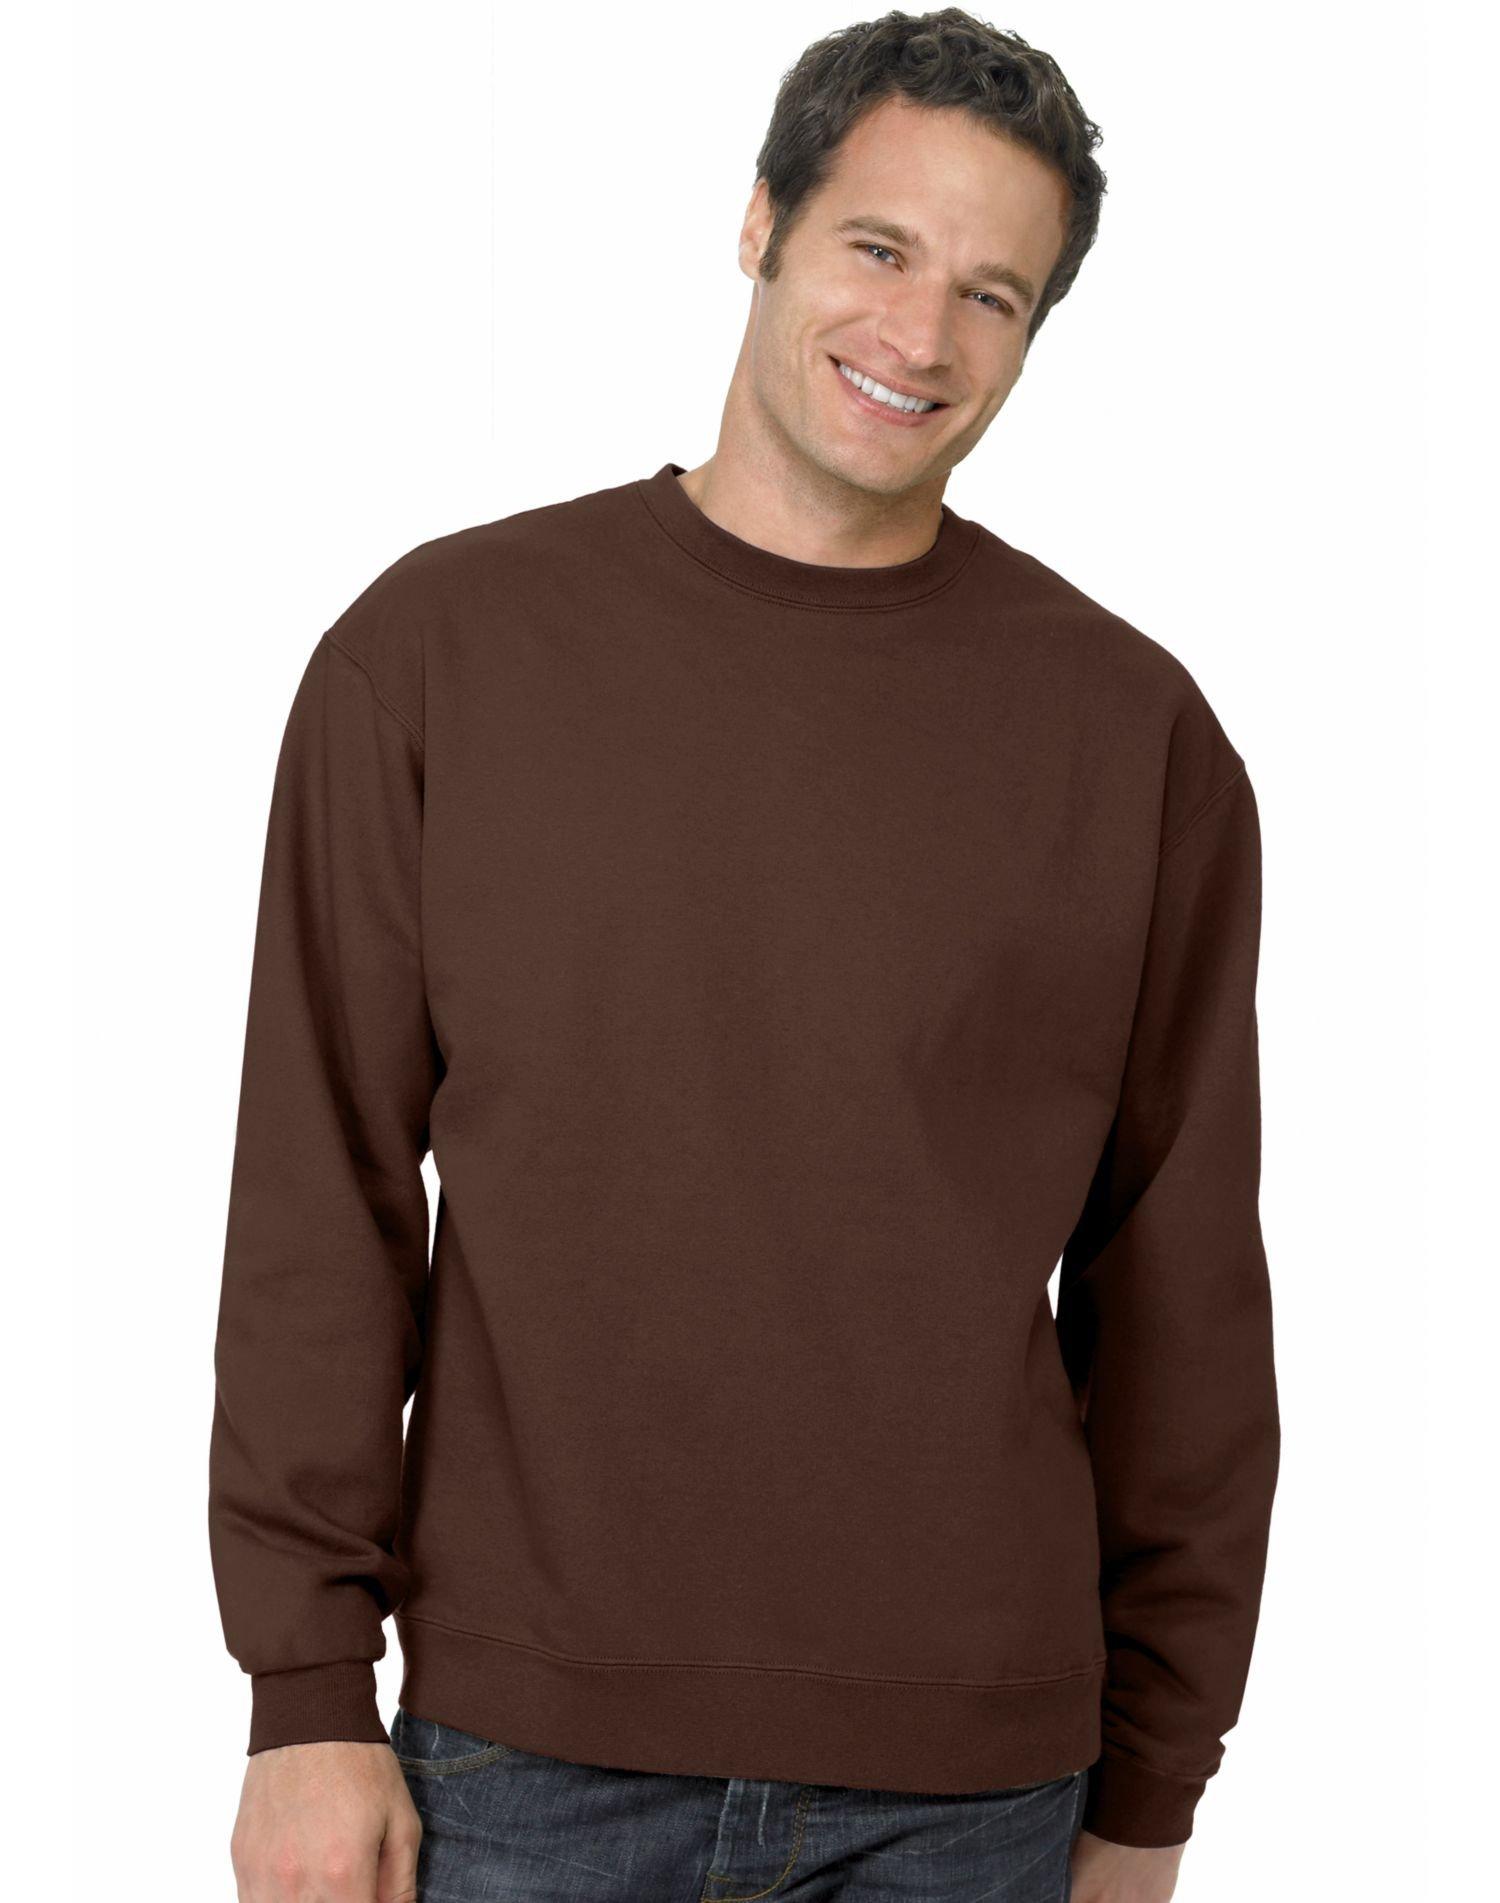 Adult Hanes 7.8-oz ComfortBlend EcoSmart Crew Sweatshirt - P160 Brown 3X-Large